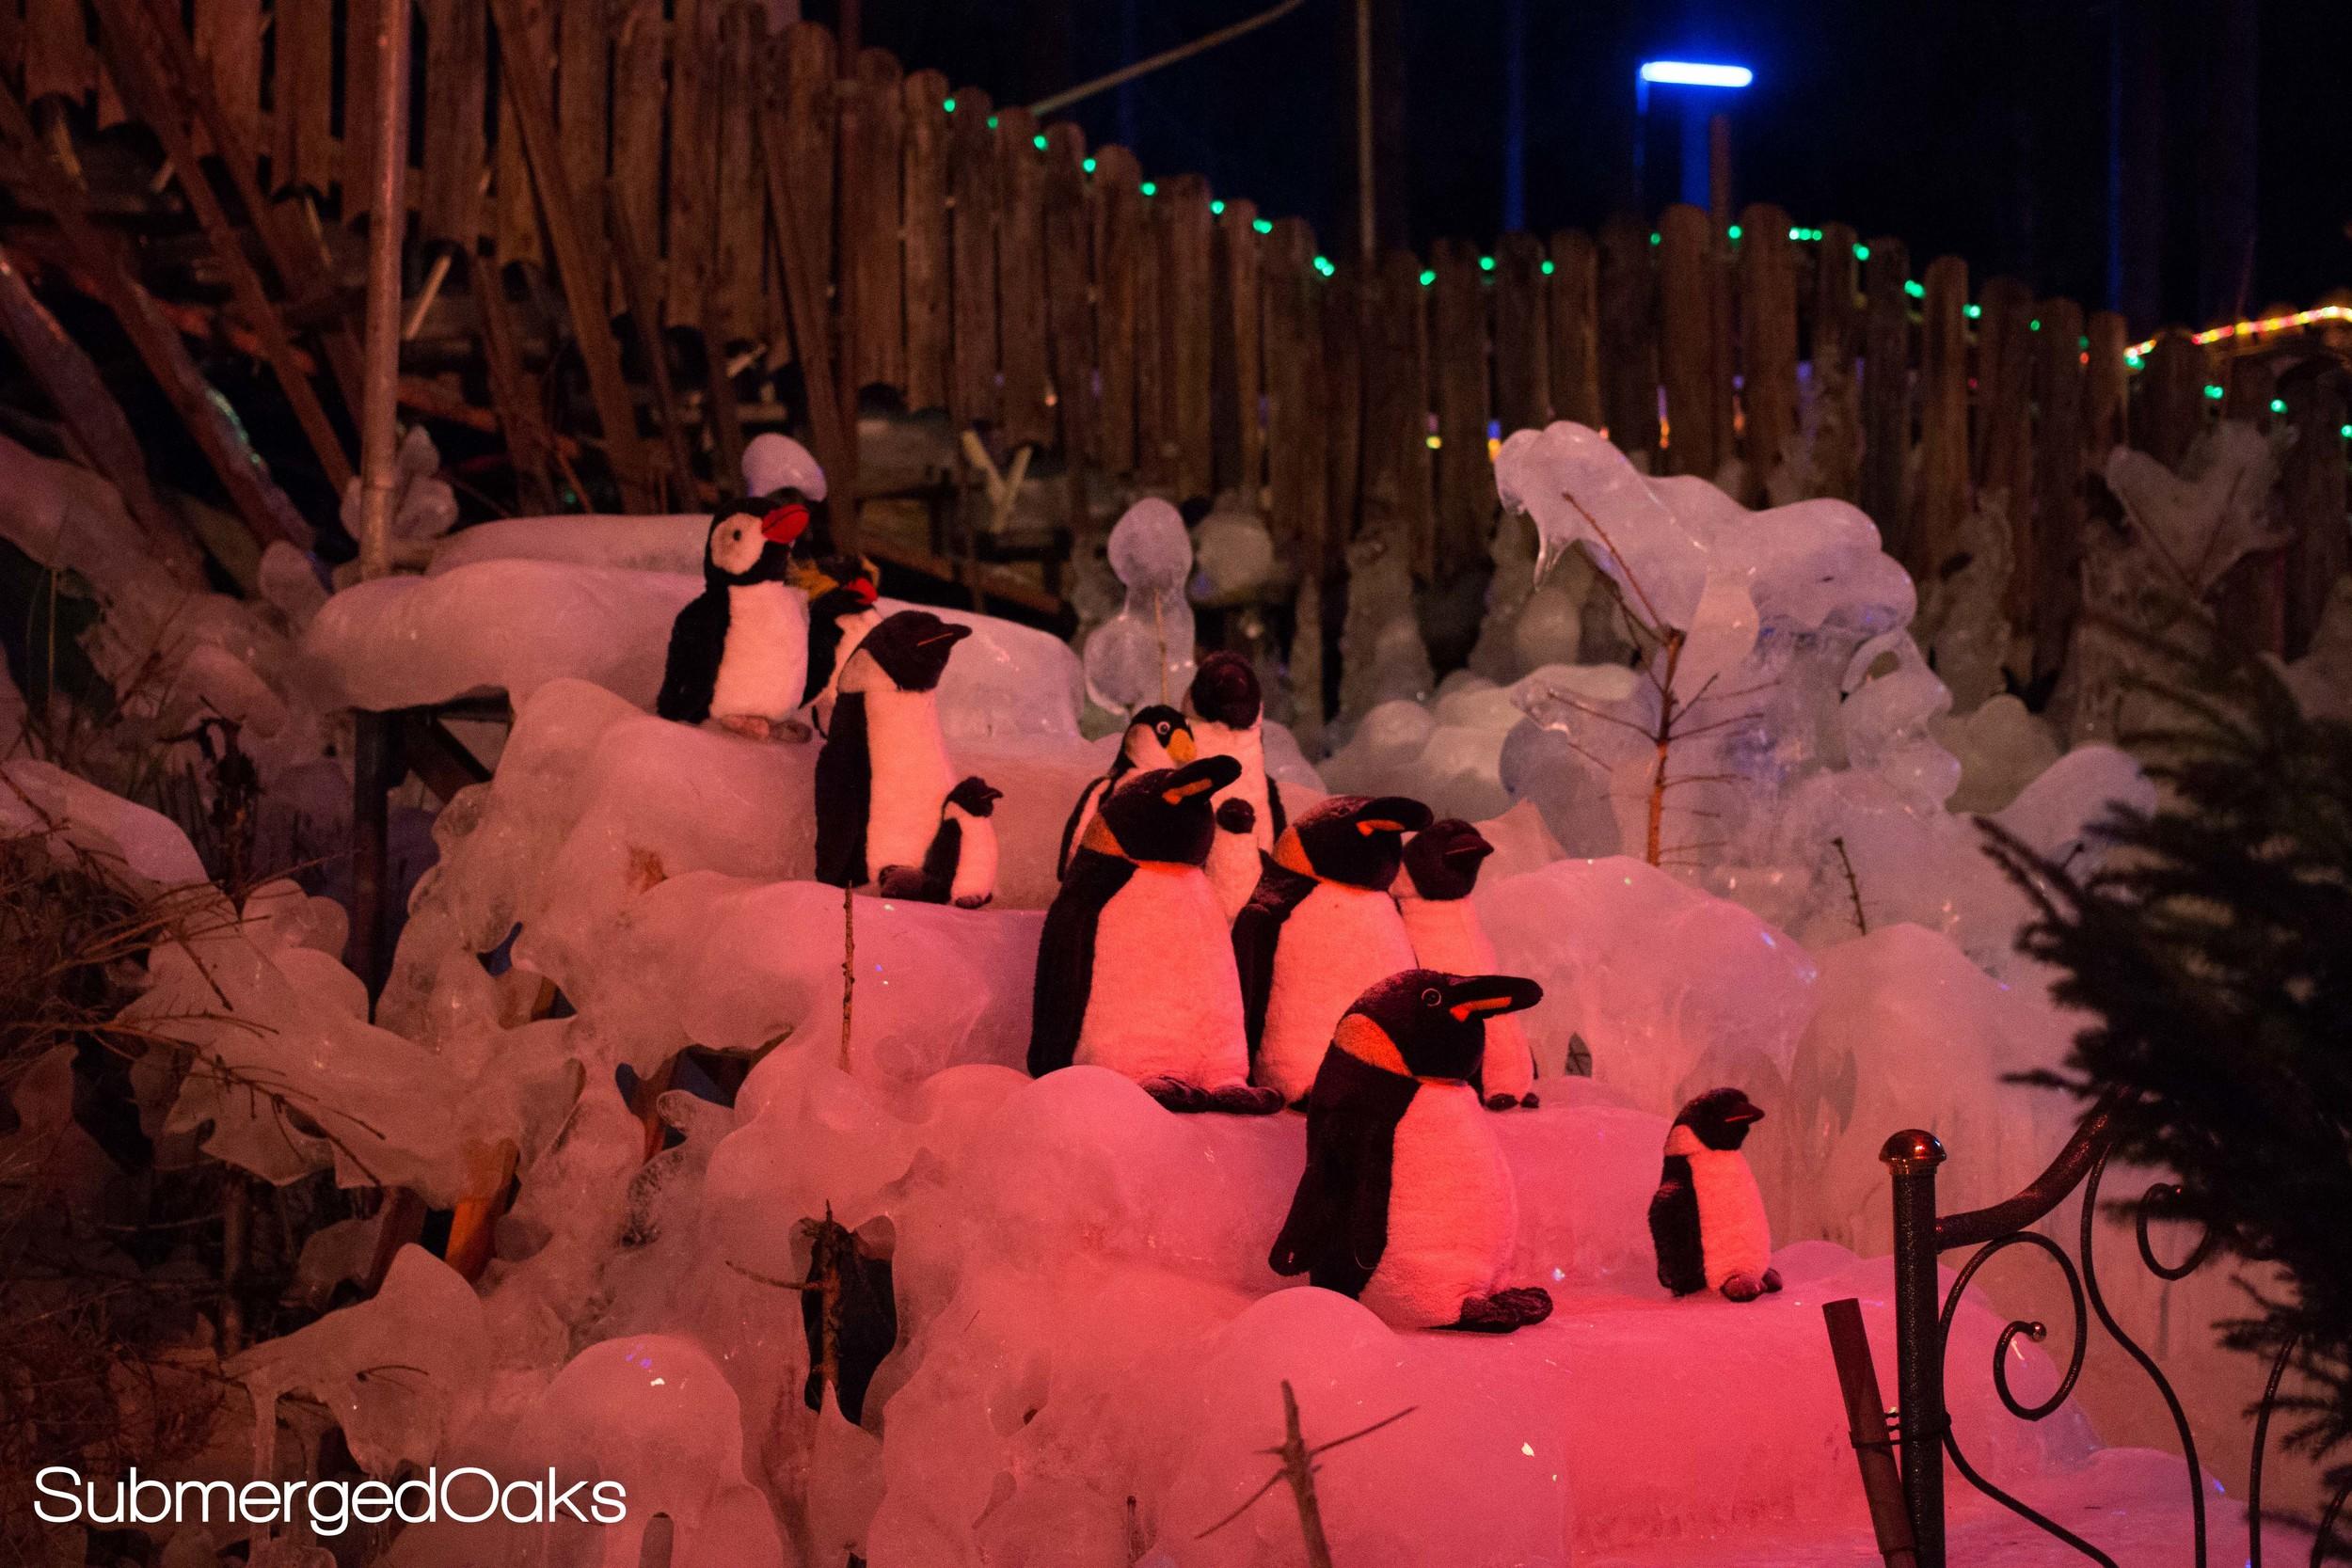 Penguins on ice steps